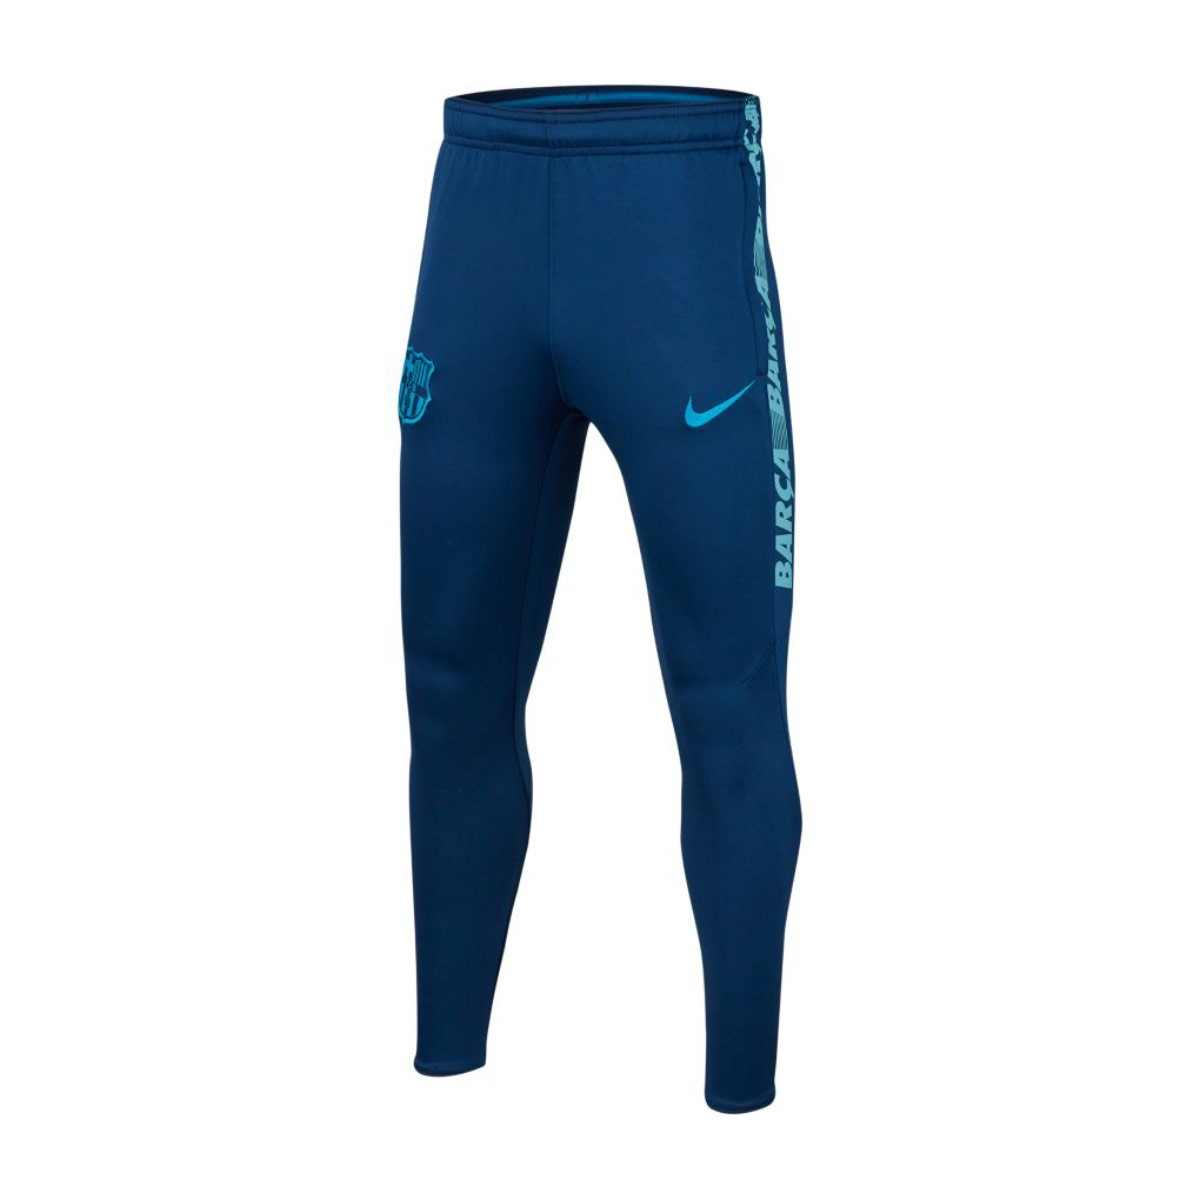 df637e2049ff4 Long pants Nike Kids Dry FC Barcelona Squad 2018-2019 Coastal blue ...